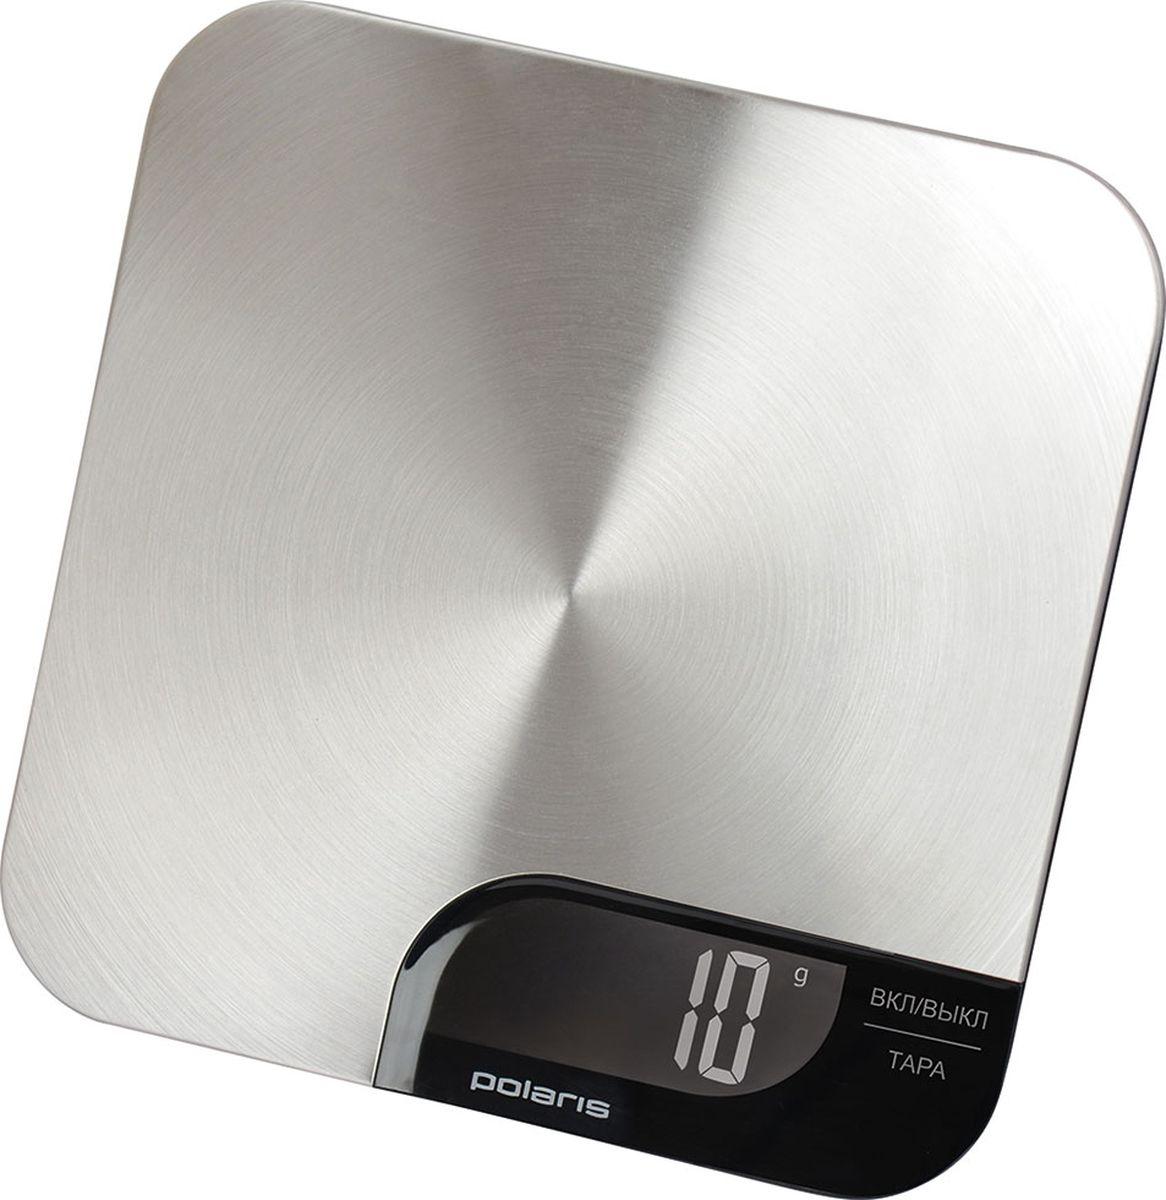 Polaris PKS 0538DM весы кухонные весы polaris pks 1043dg peaches